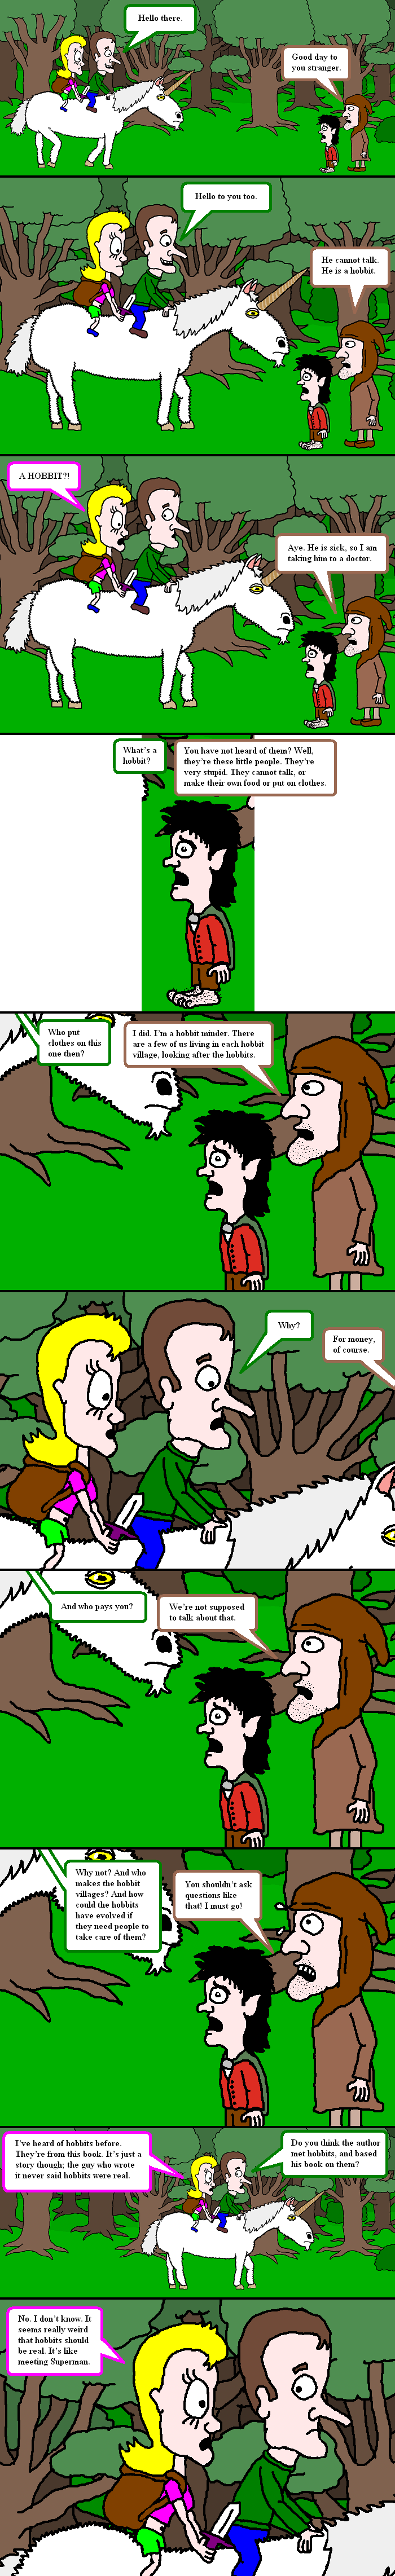 Hobbits and hobbit minders